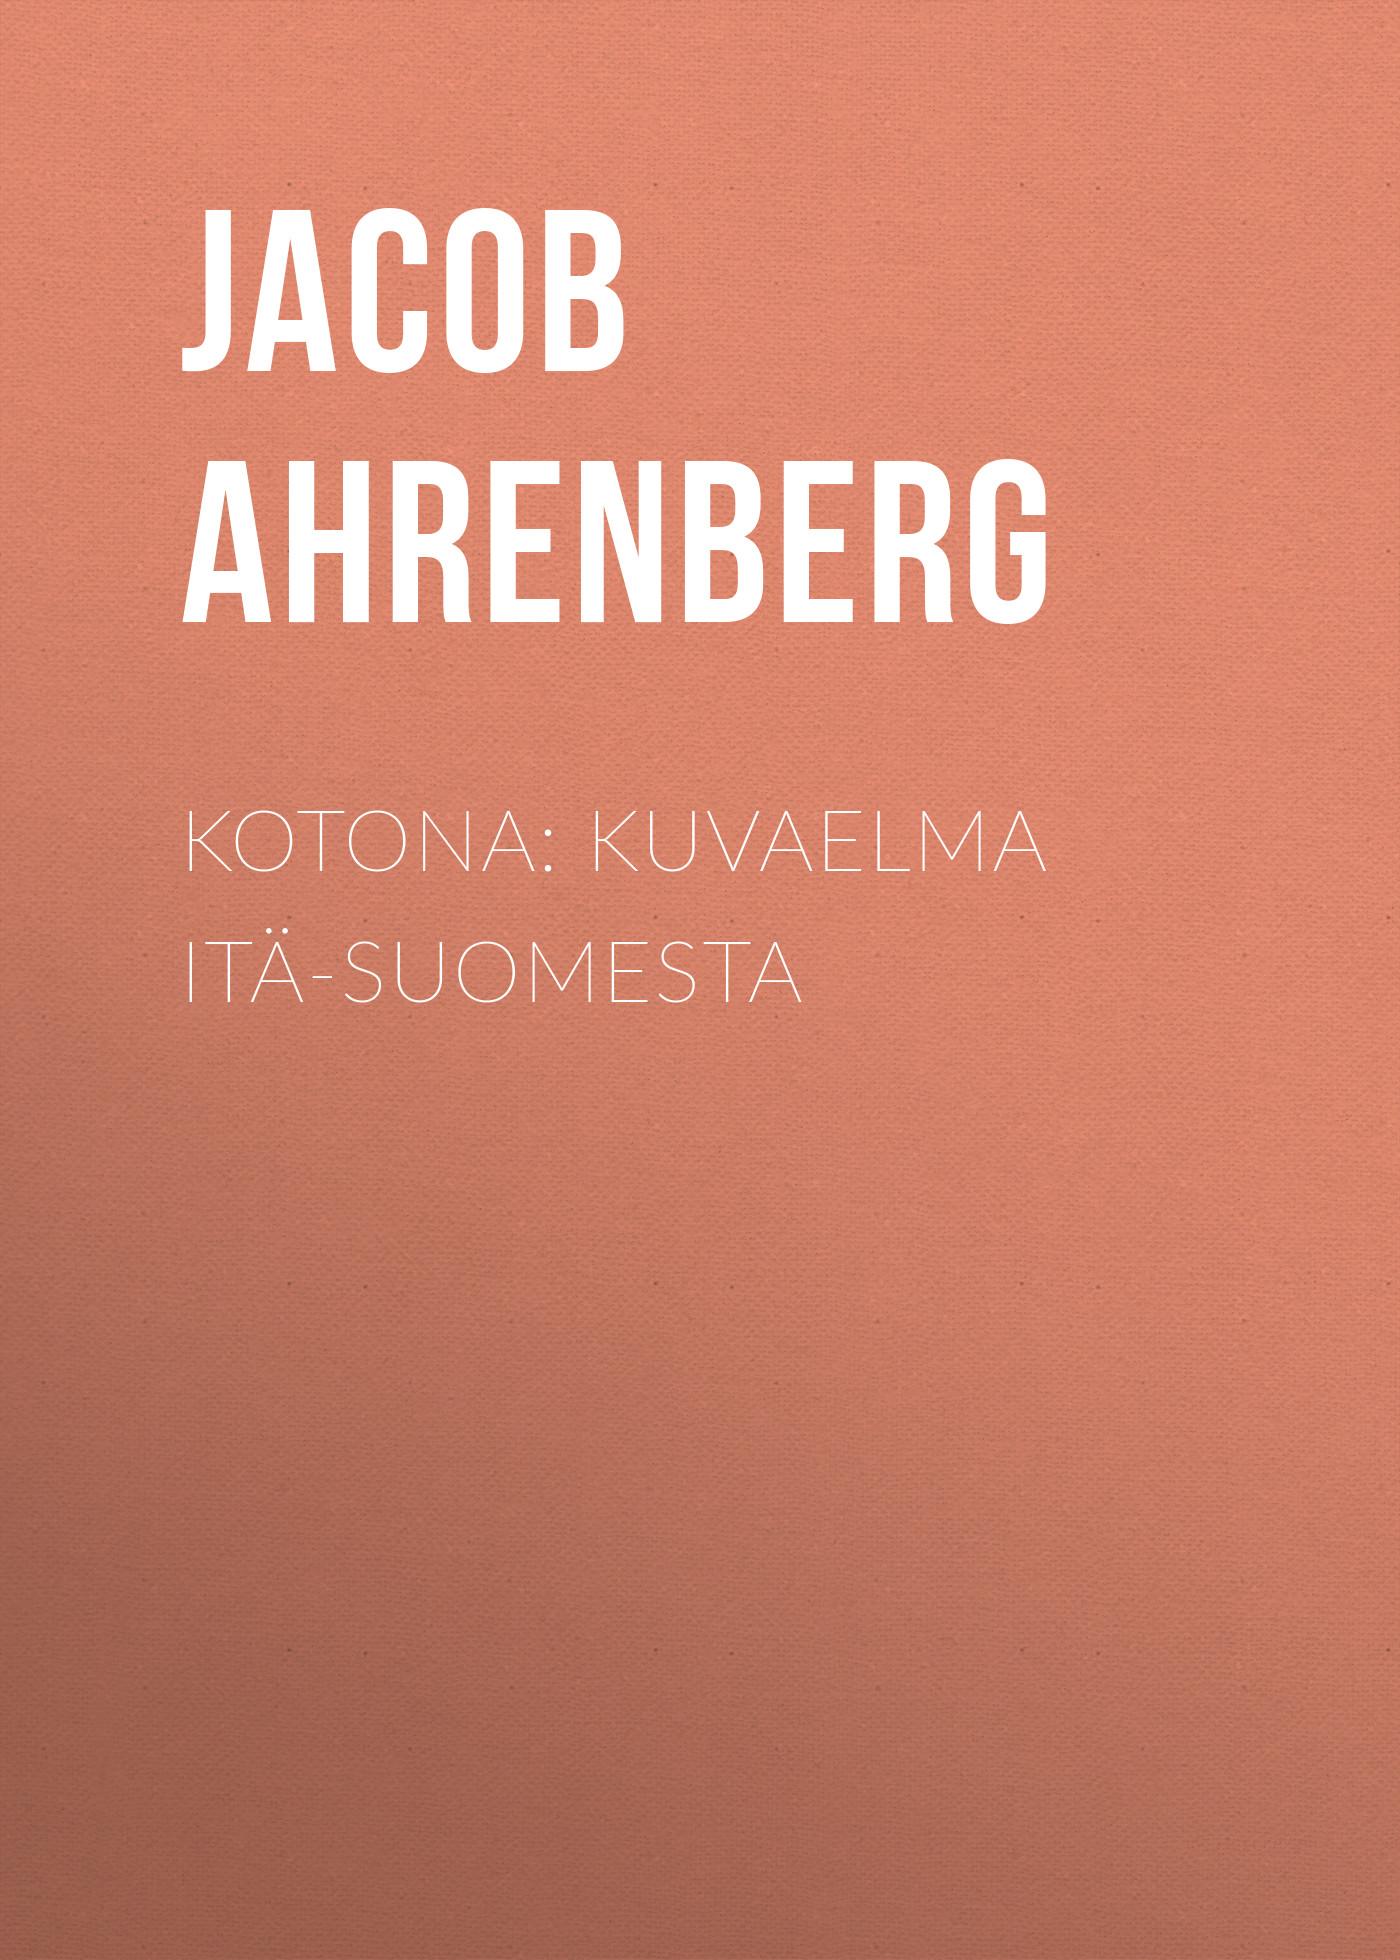 Jacob Ahrenberg Kotona: Kuvaelma Itä-Suomesta jacob ahrenberg hihhuleita kuvauksia itä suomesta